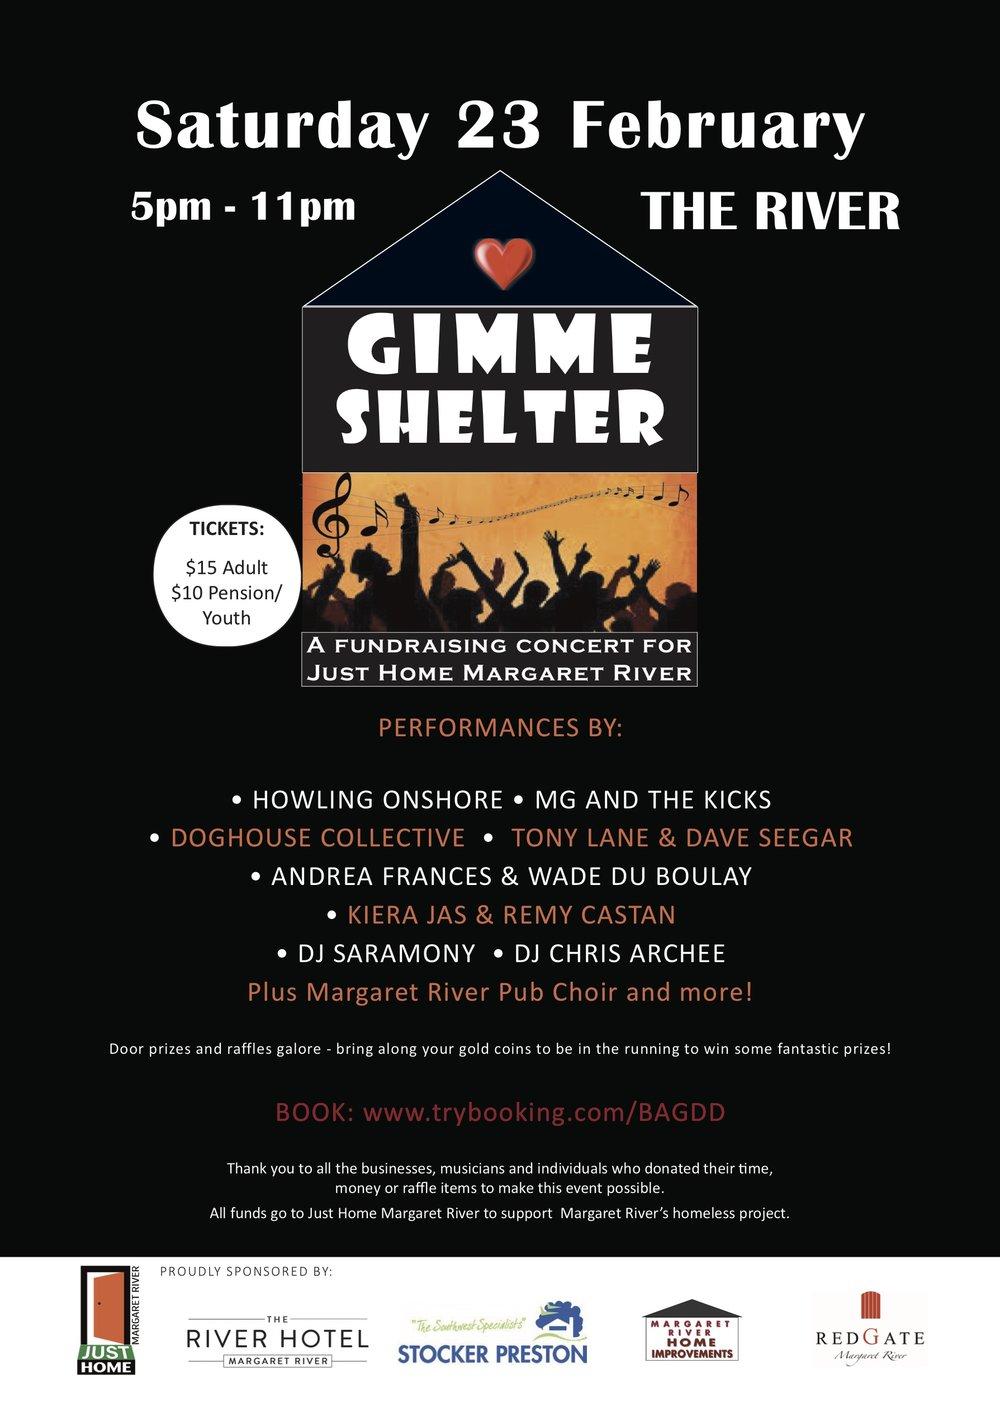 Gimme shelter A3 poster.jpg